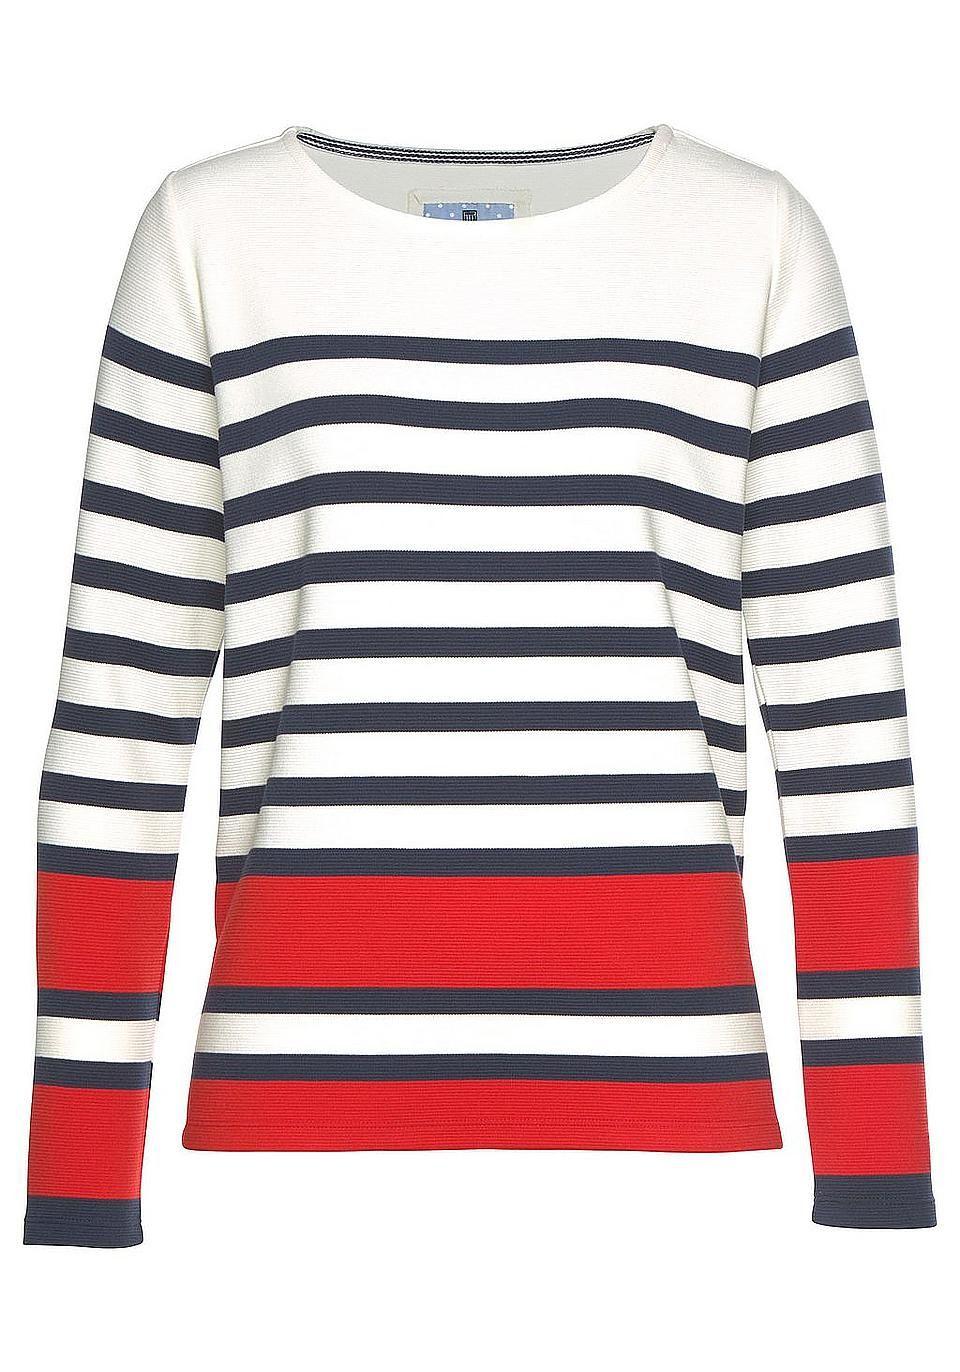 BASEFIELD Sweatshirt online bestellen | Maritime mode ...